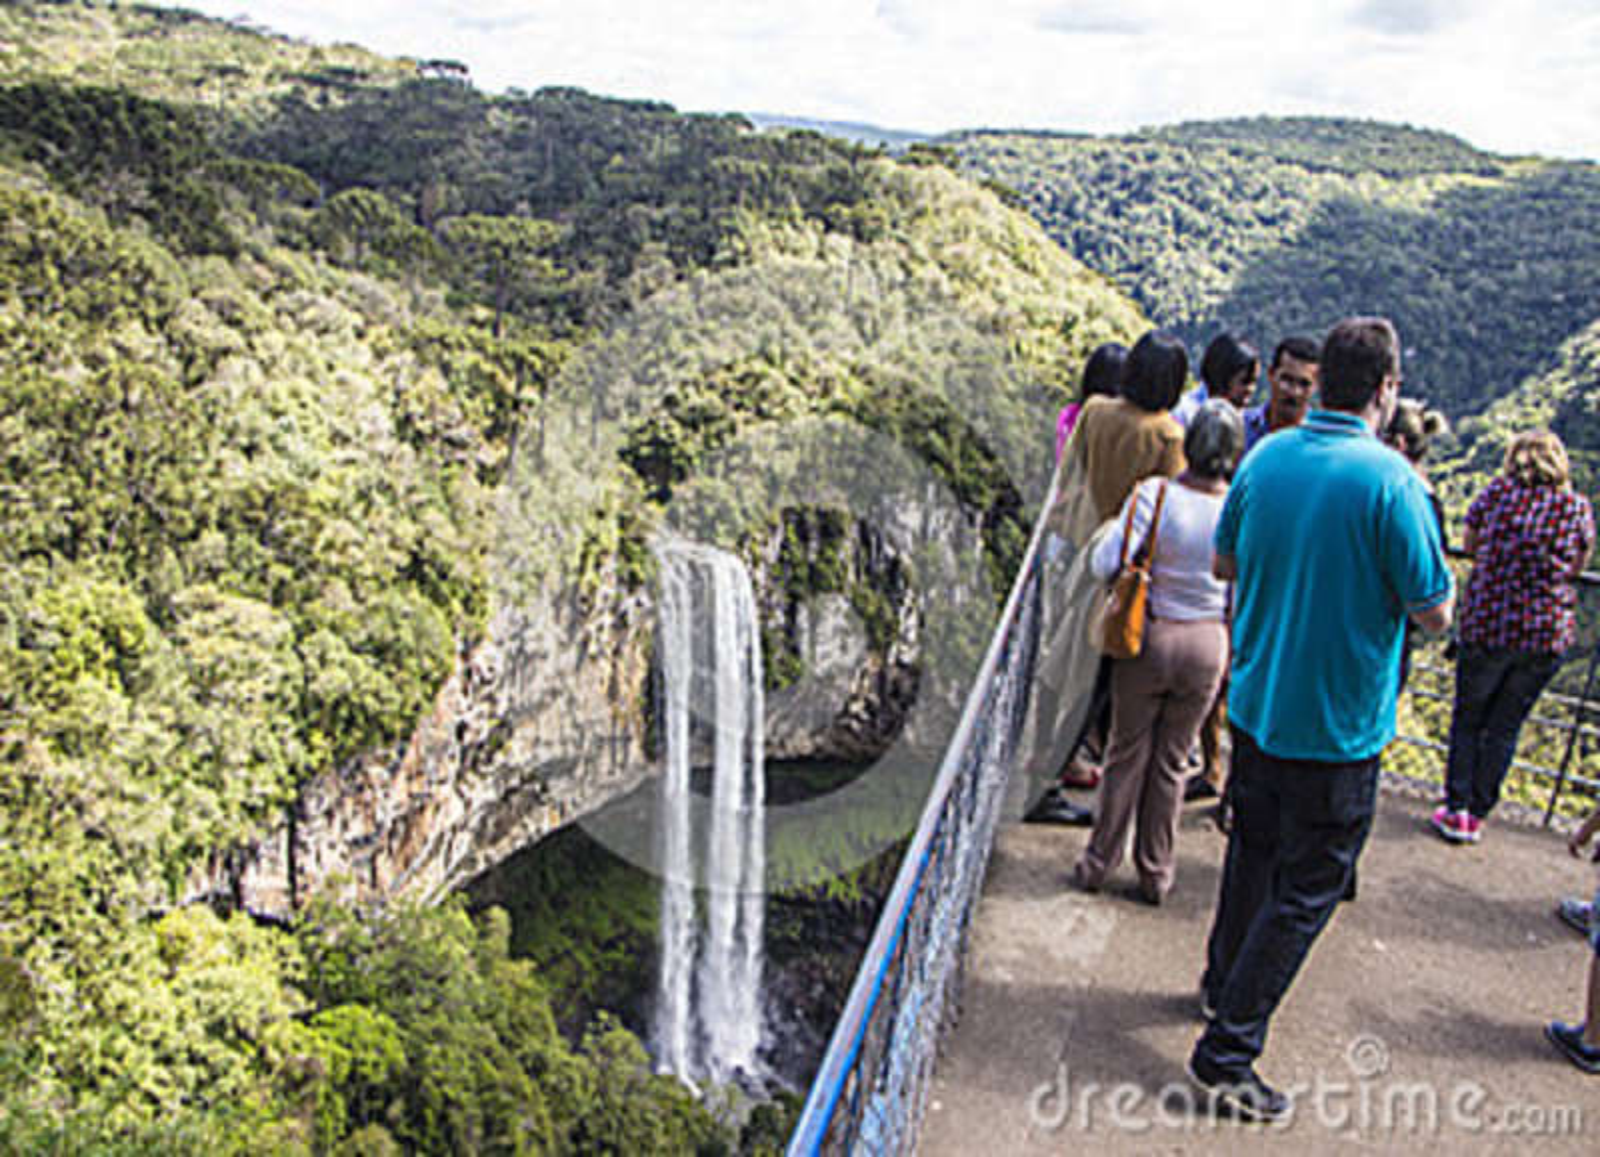 Canela - Rio Grande doe Sul - Brazilië